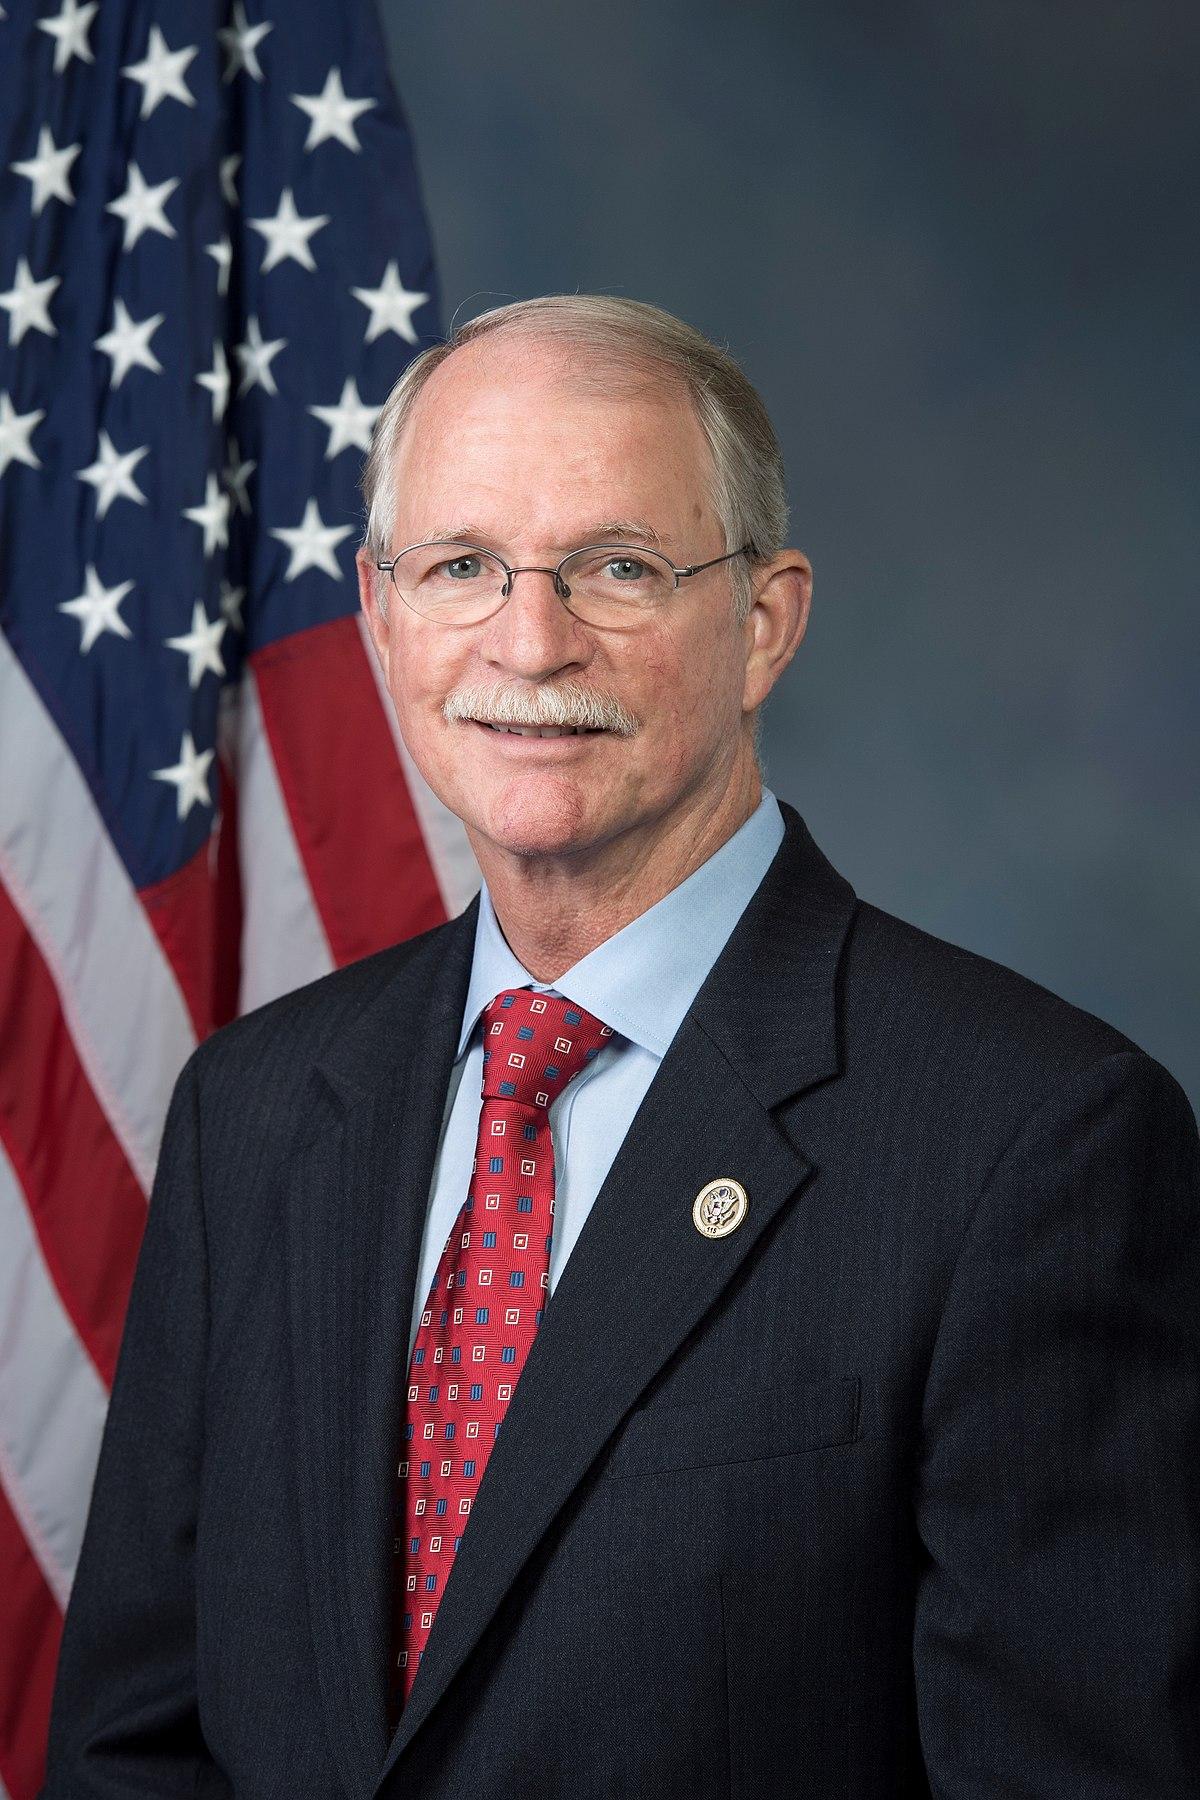 John Rutherford (Florida politician) - Wikipedia